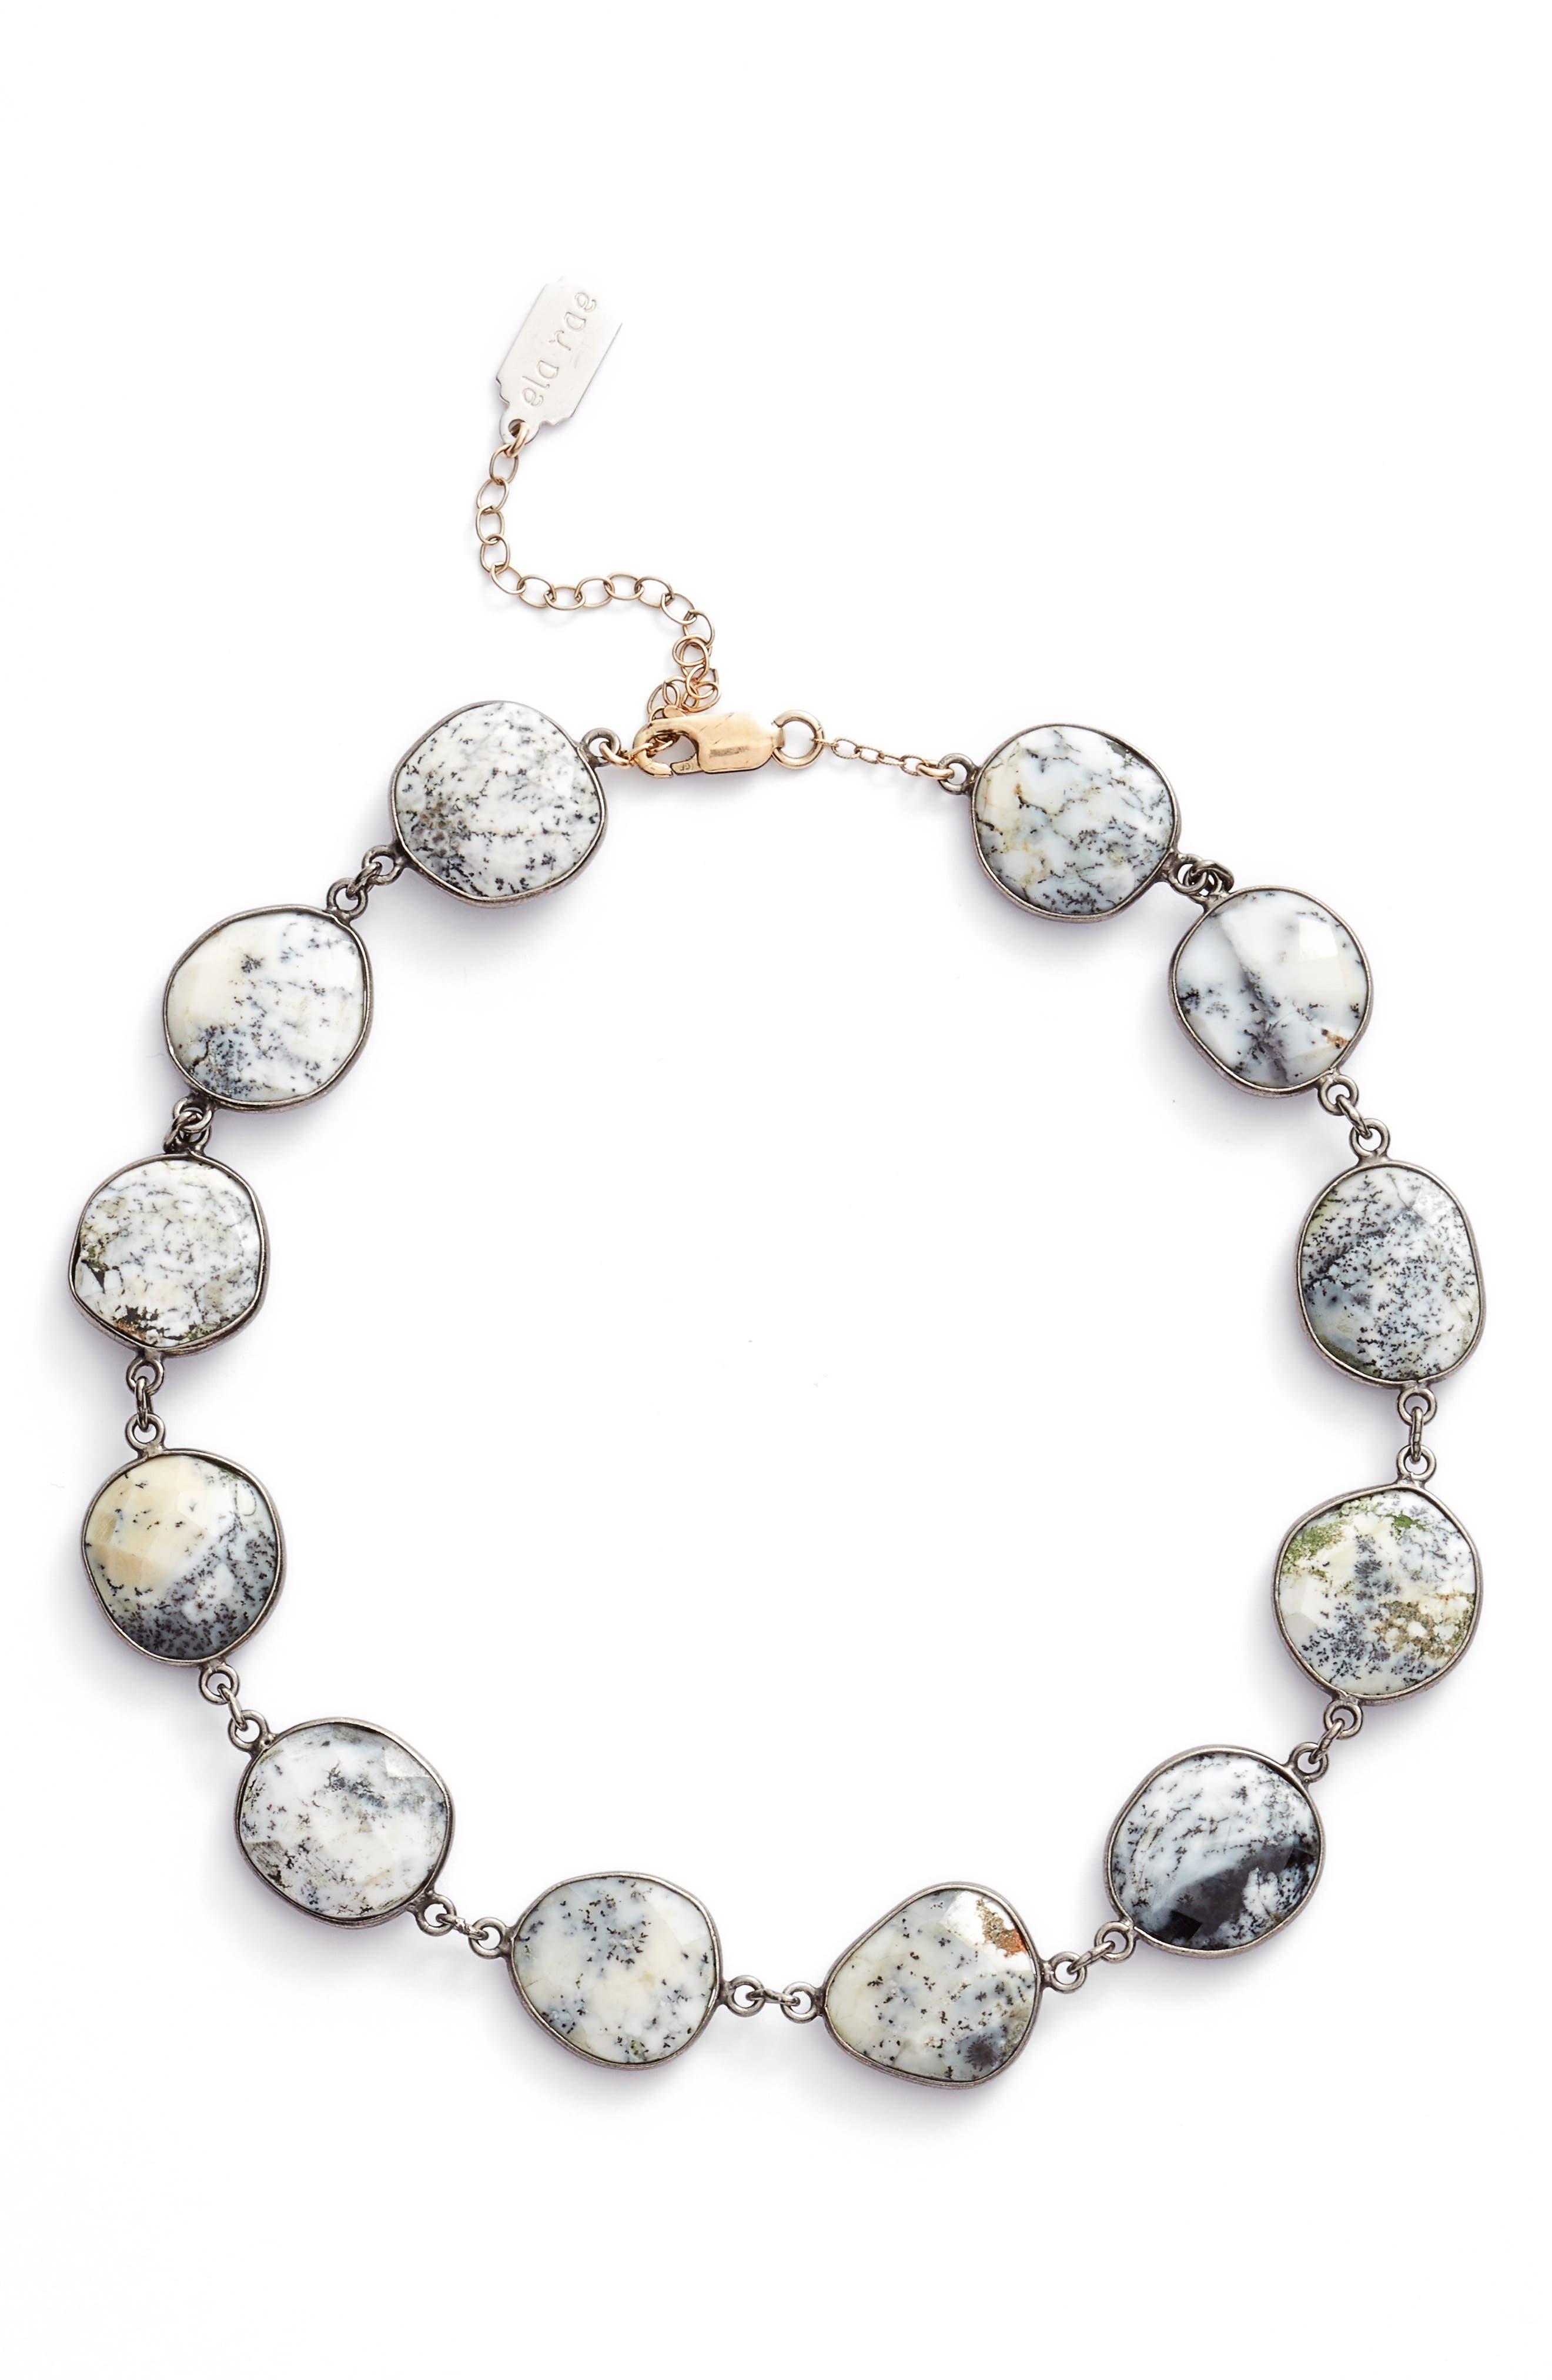 Suze Semiprecious Stone Collar Necklace,                             Main thumbnail 1, color,                             DENDRITE OPAL